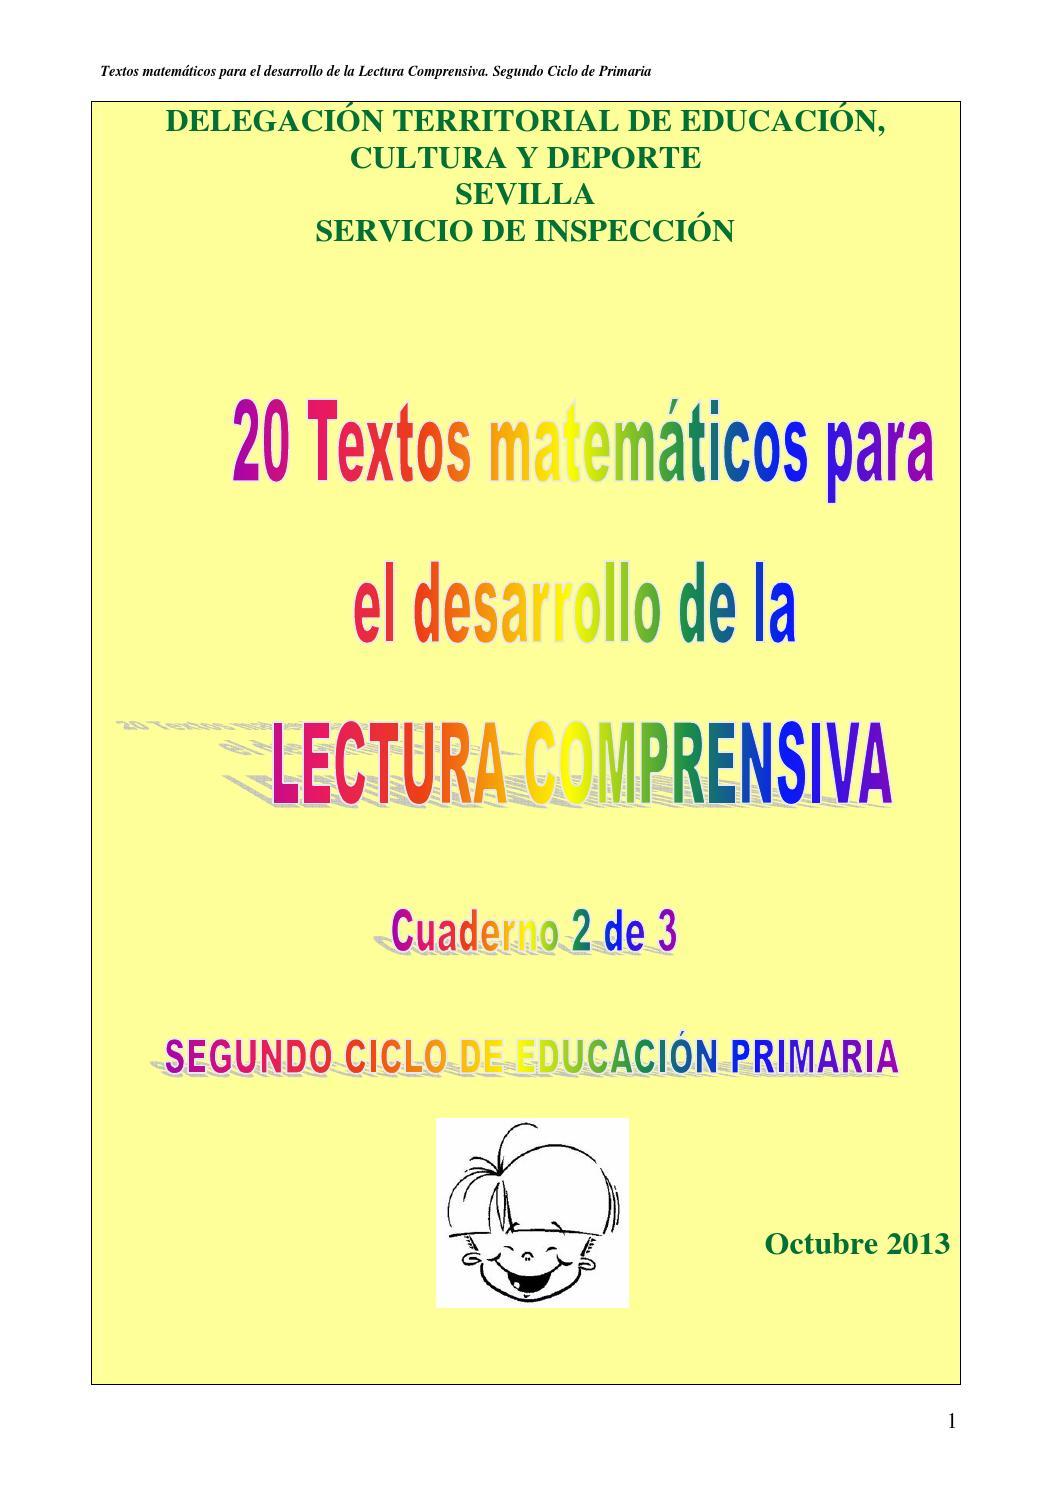 Textos matematicos lectura comprensiva e primaria ciclo 2 copia by ...